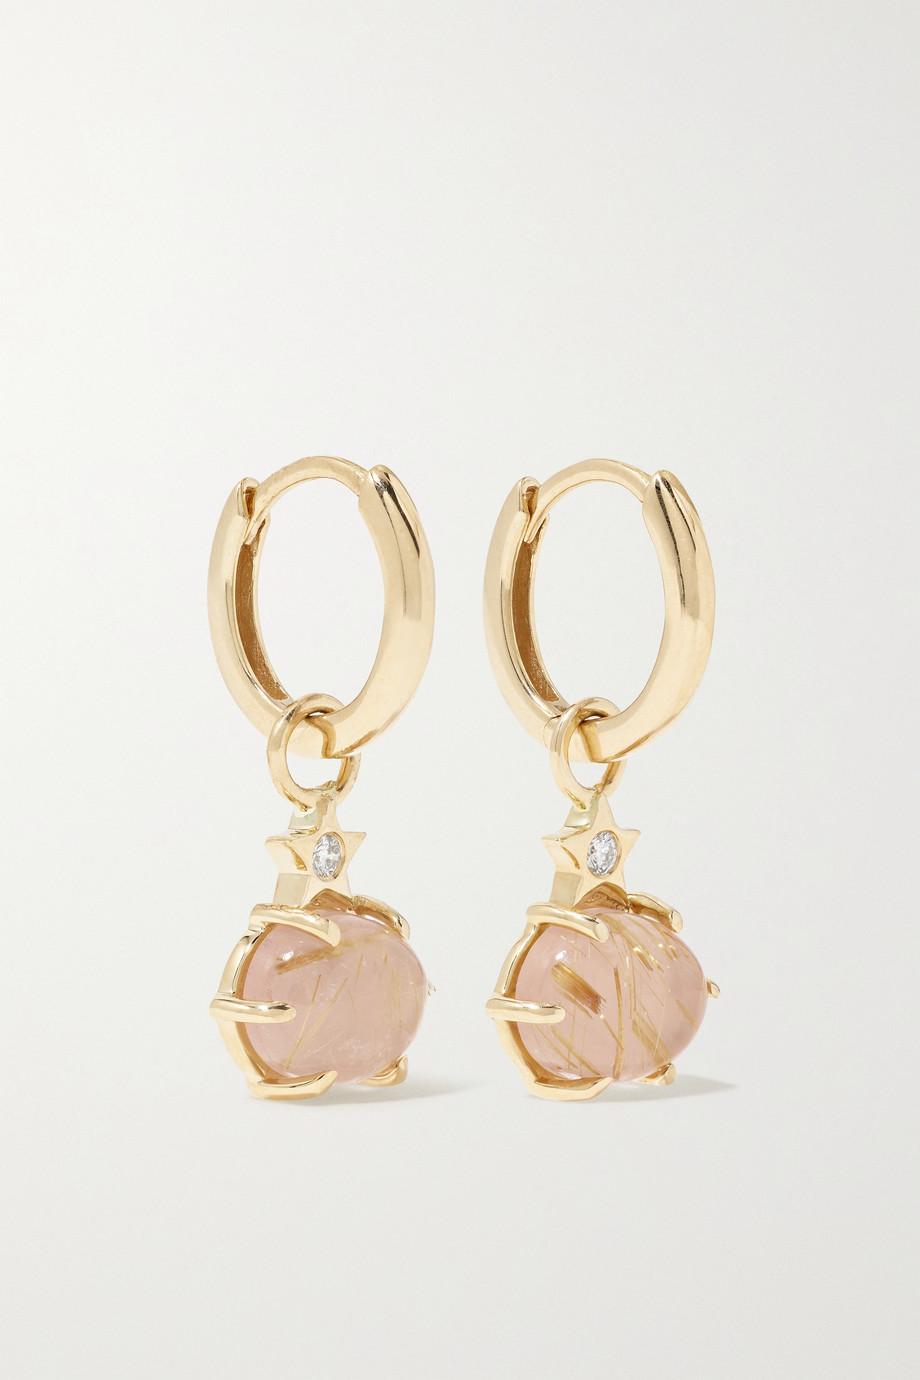 Andrea Fohrman Mini Cosmo 14-karat gold, quartz and diamond earrings